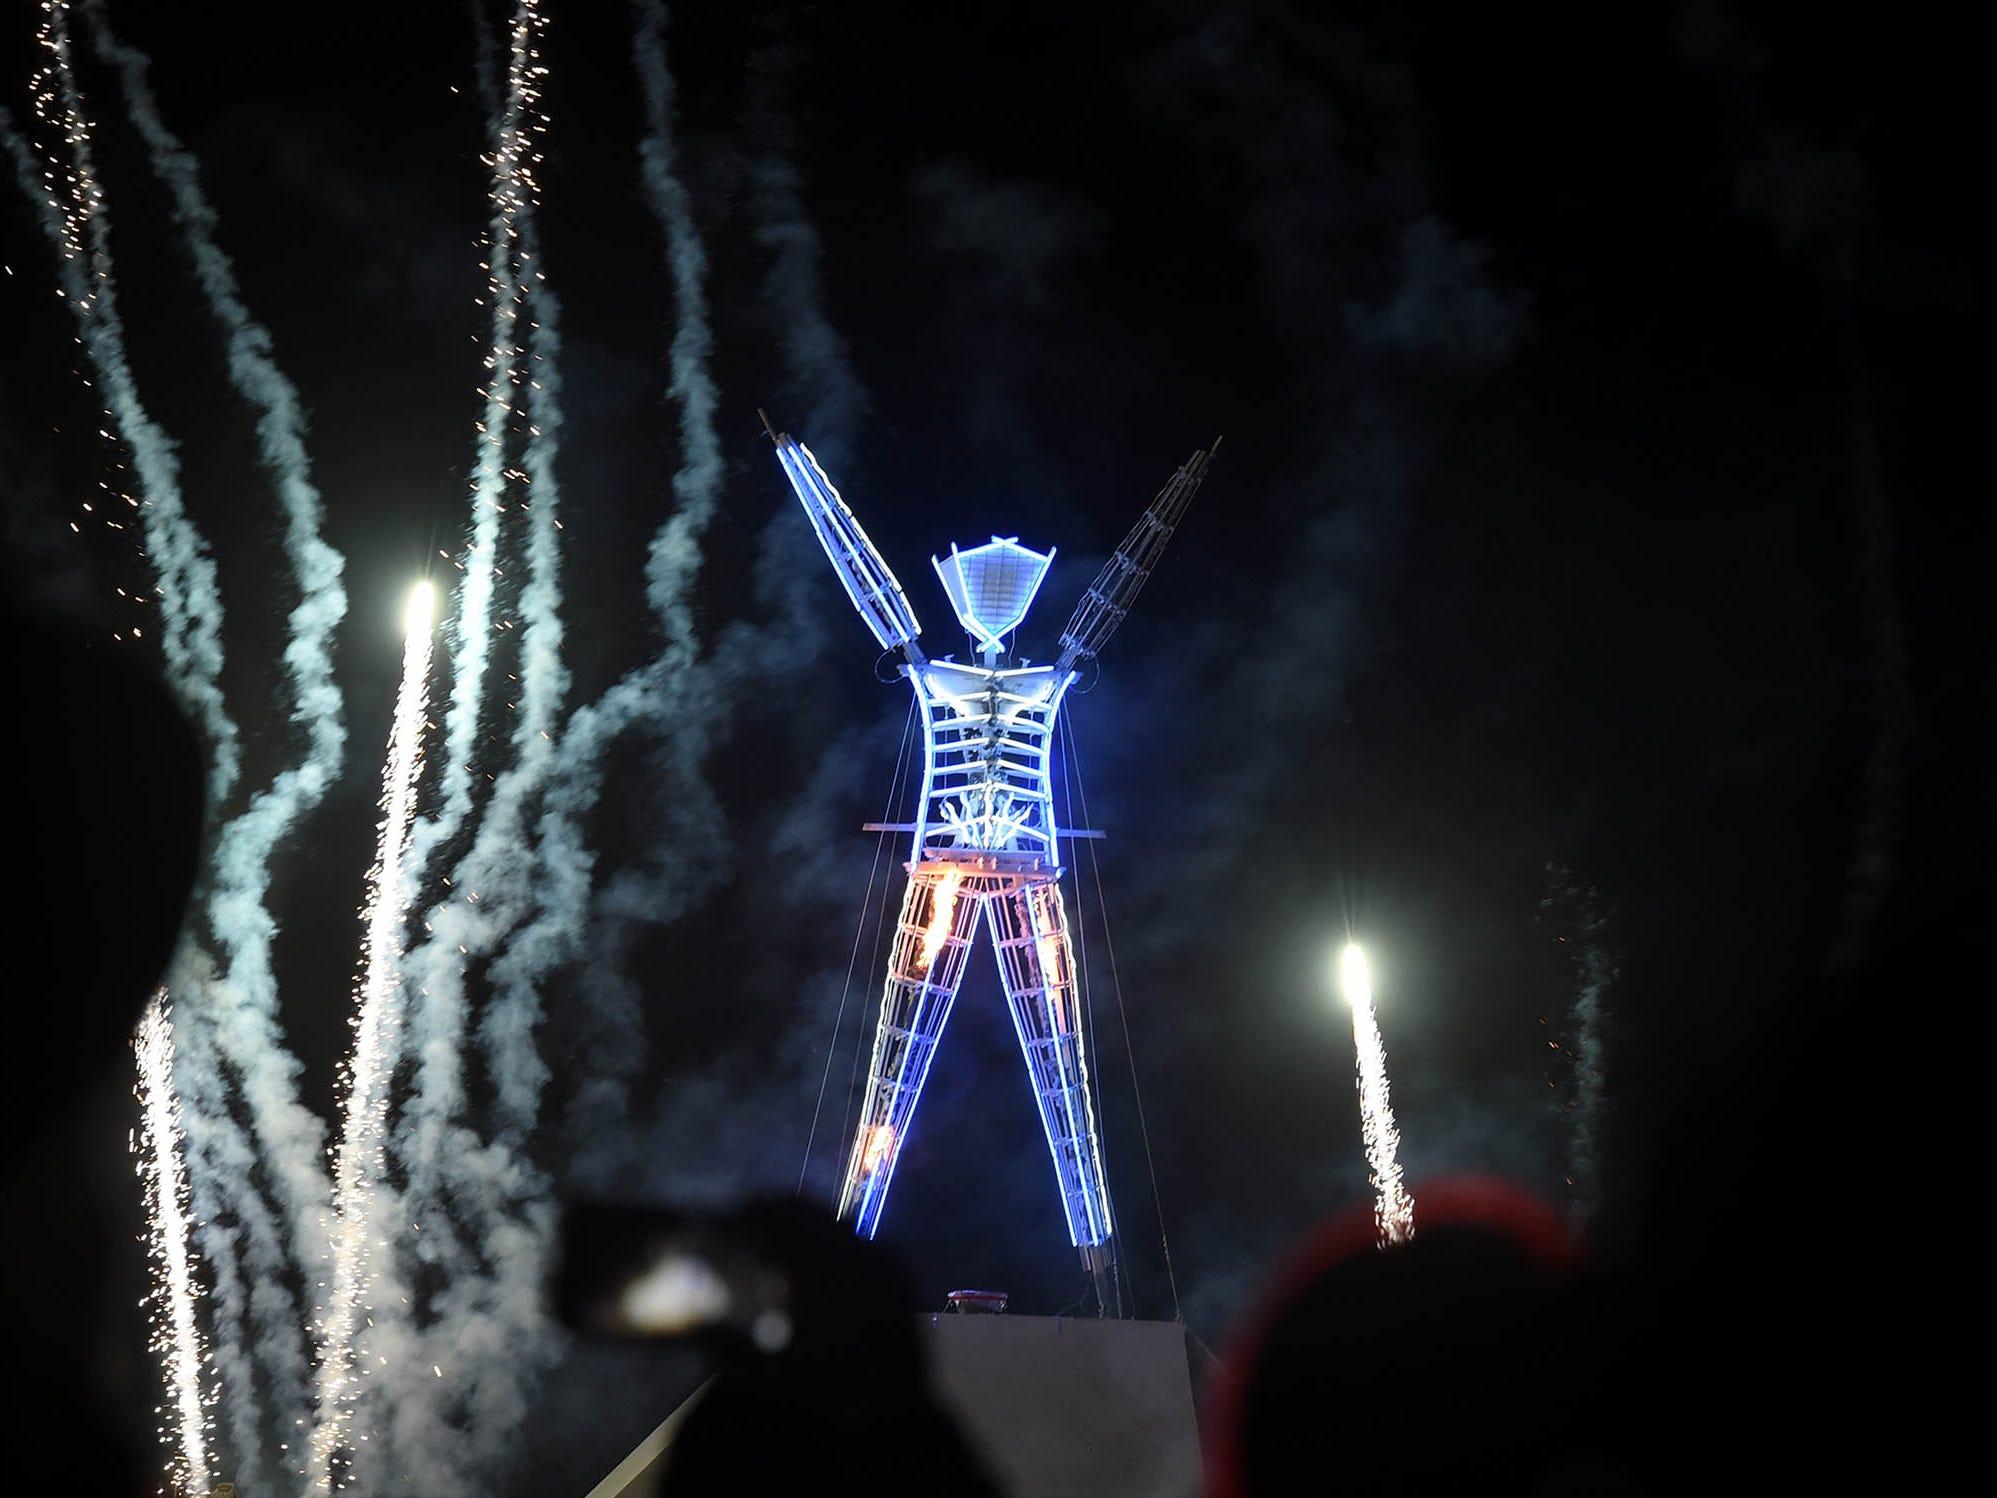 The Man effigy at Burning Man 2018.